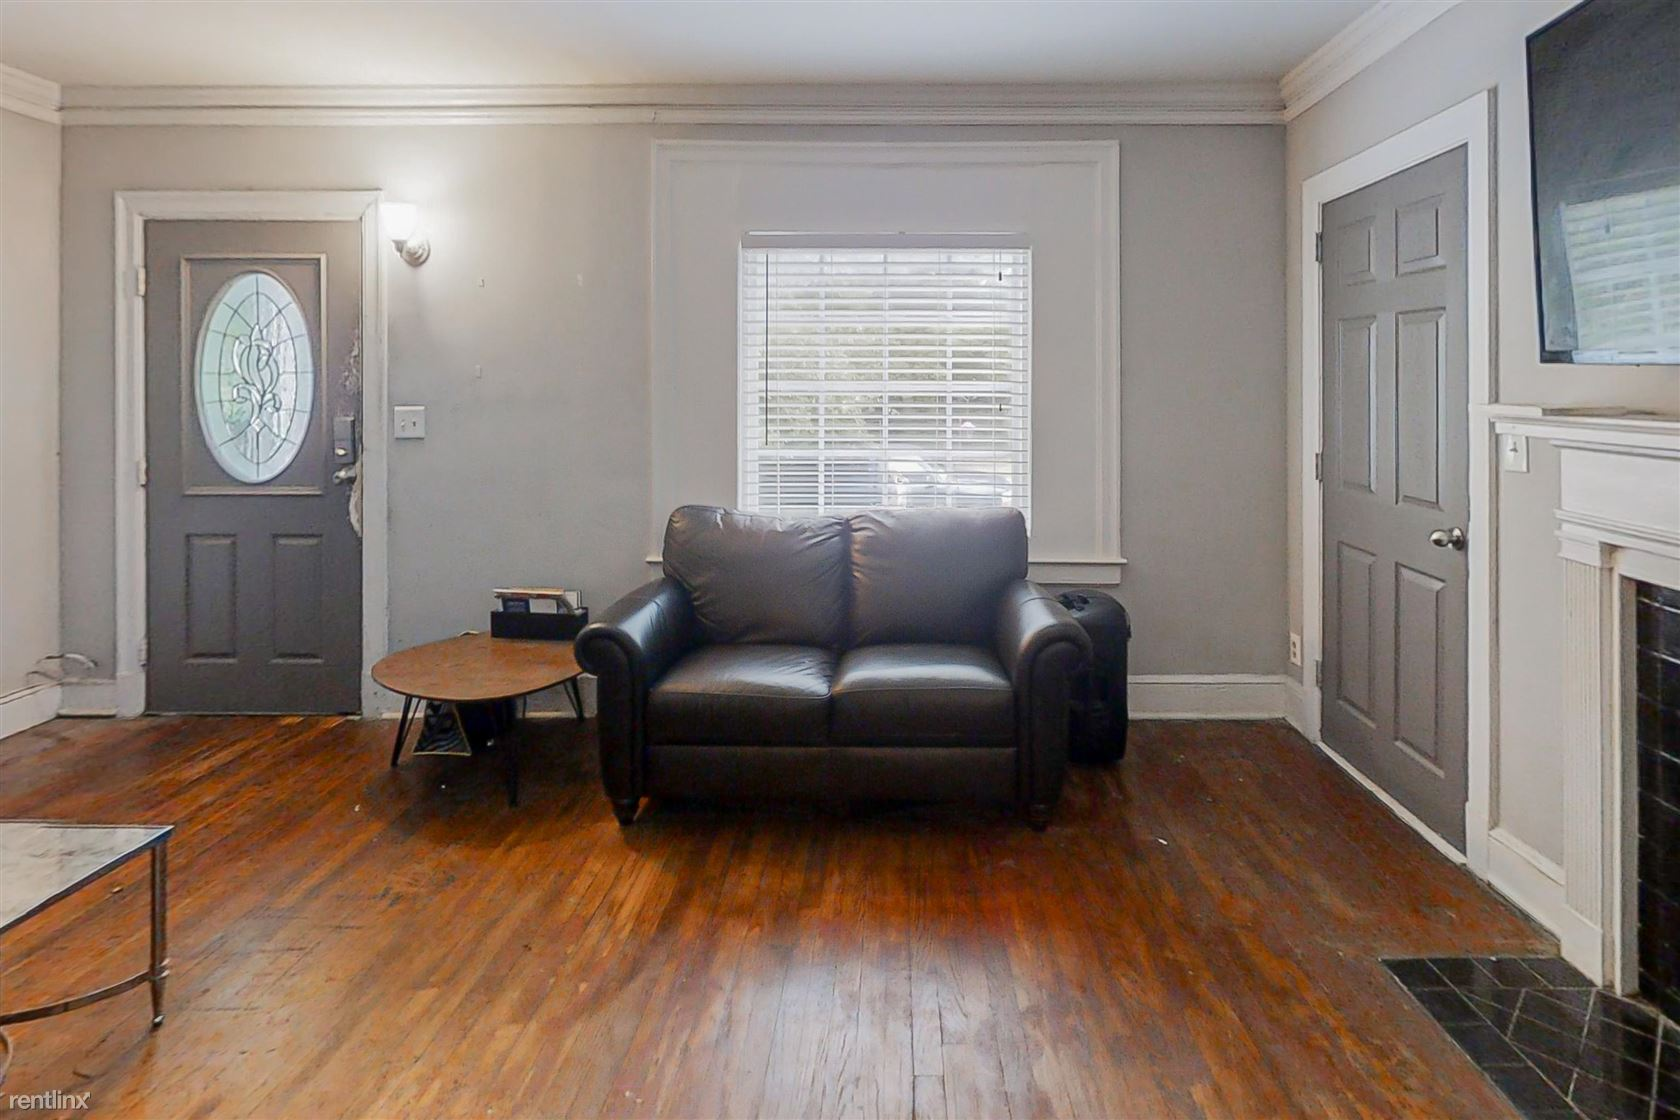 Westview Dr SW & Hopkins St Sw, Ga (id.47) rental